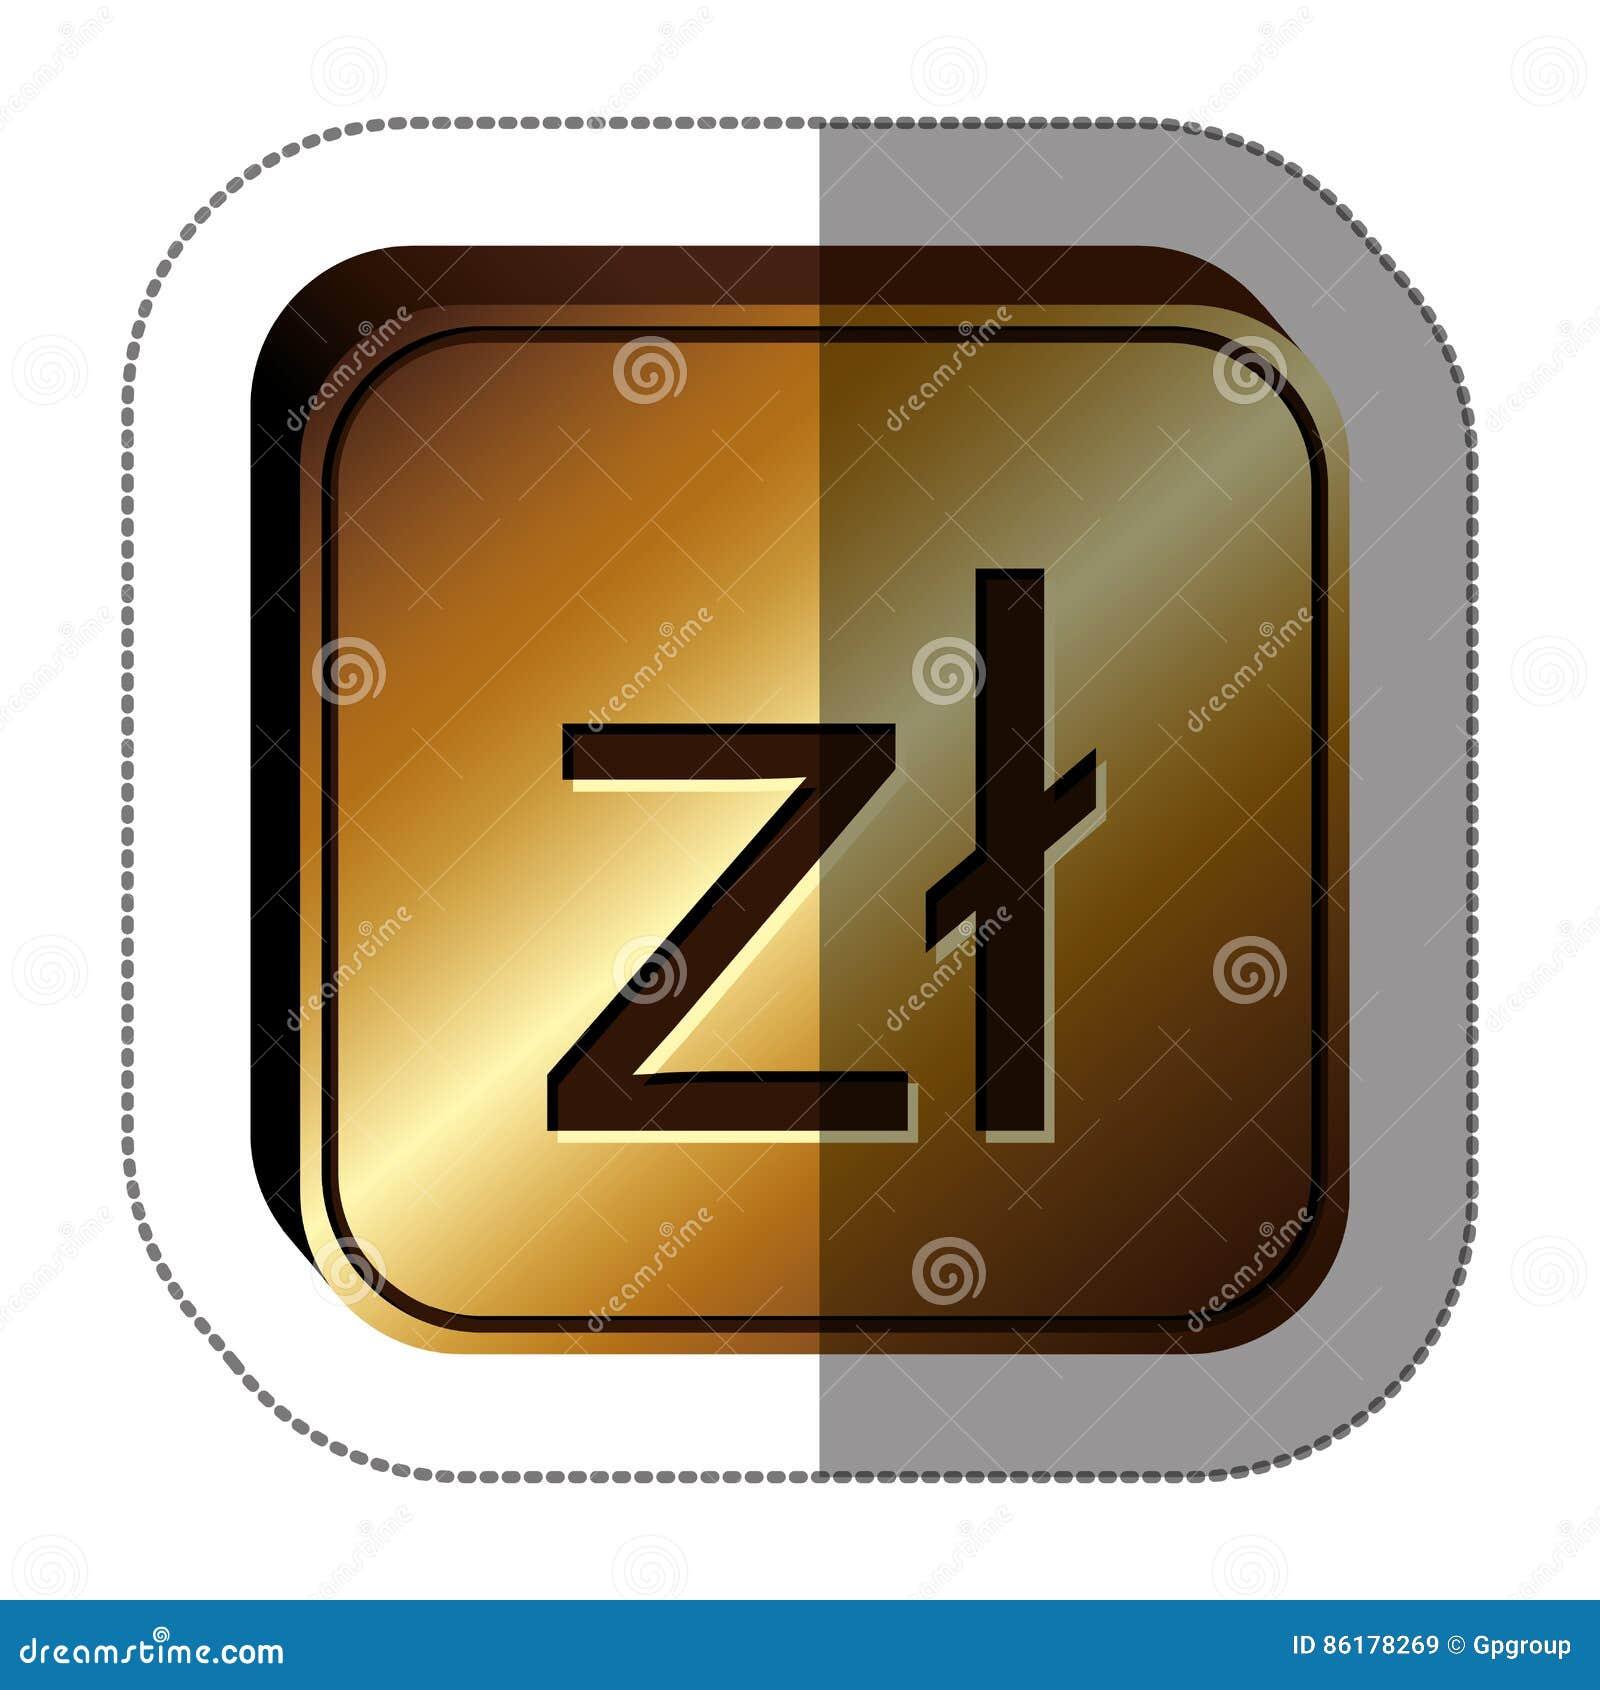 Polish Zloty Currency Symbol Icon Stock Illustration Illustration